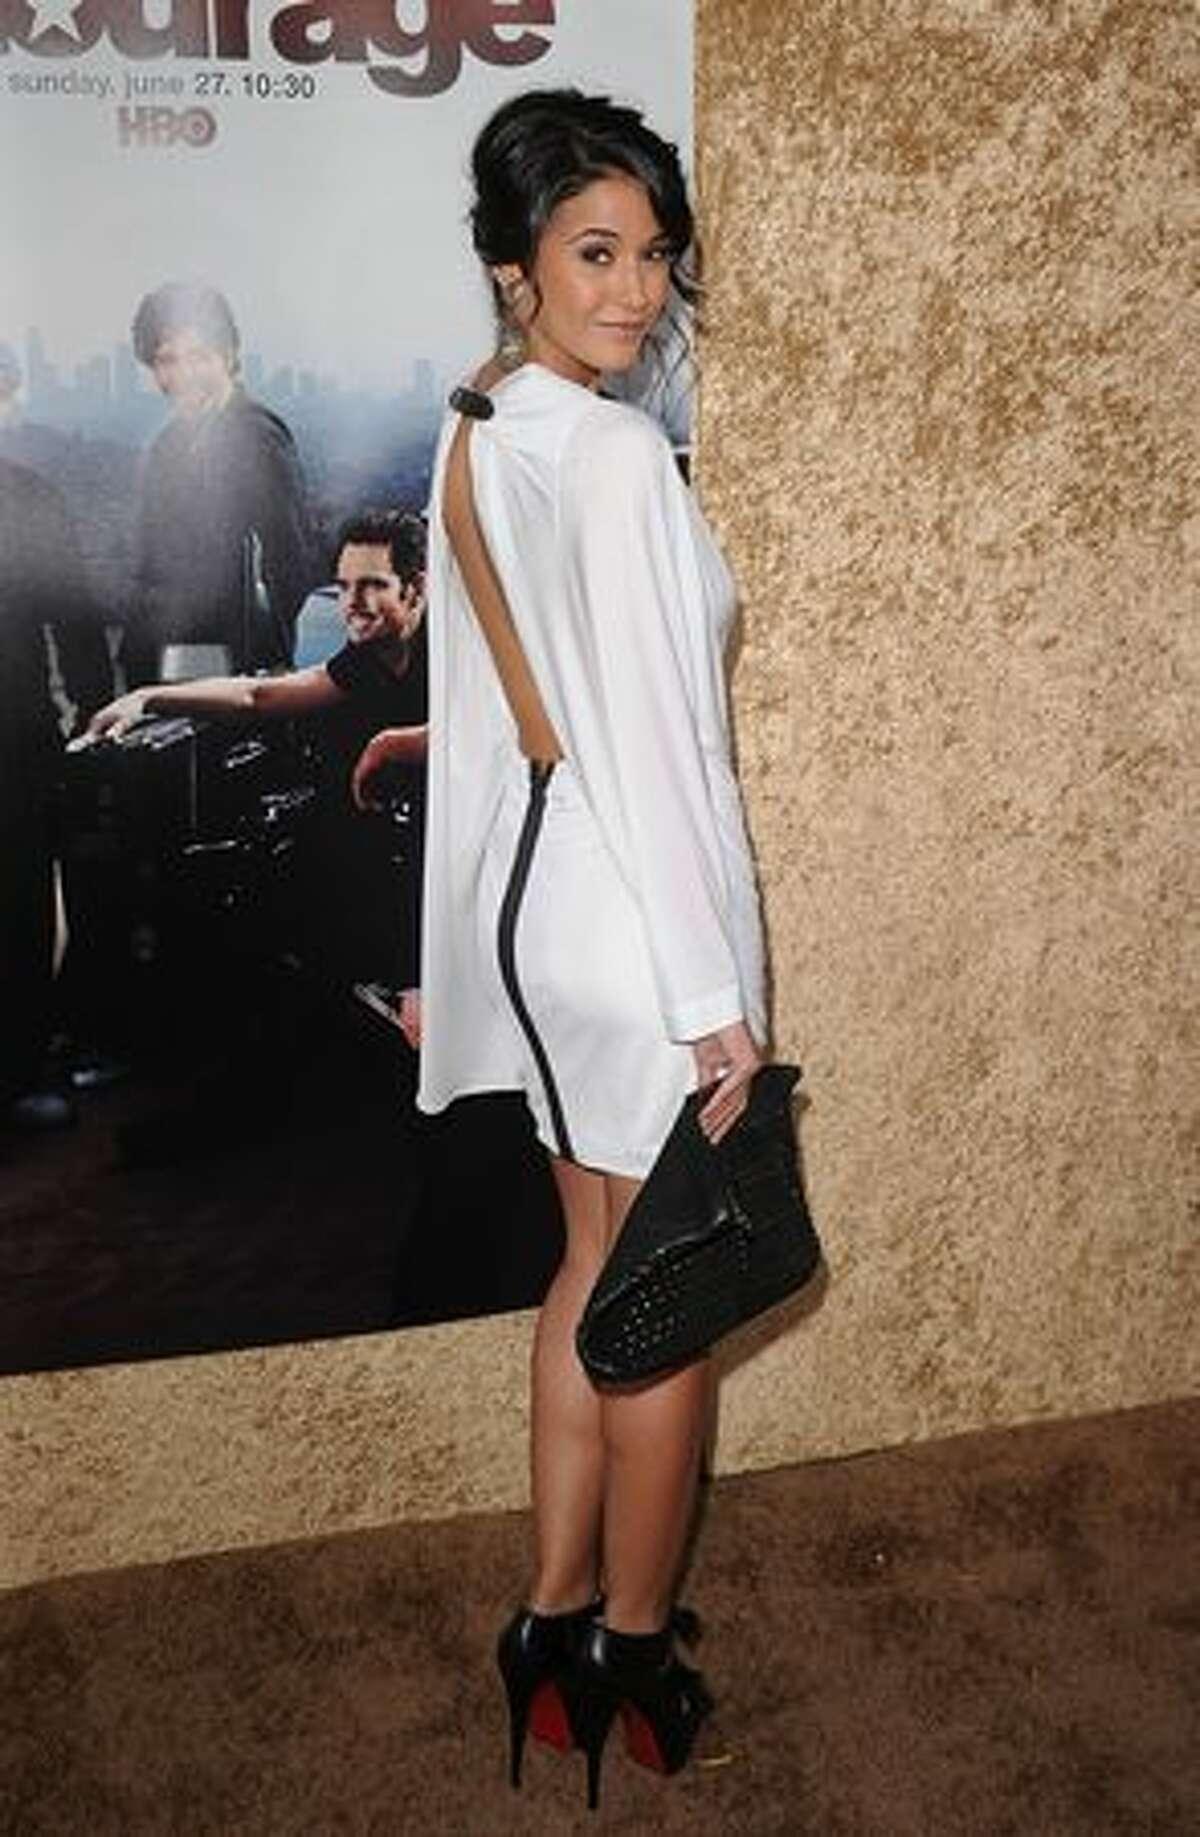 Actress Emmanuelle Chriqui arrives at HBO's